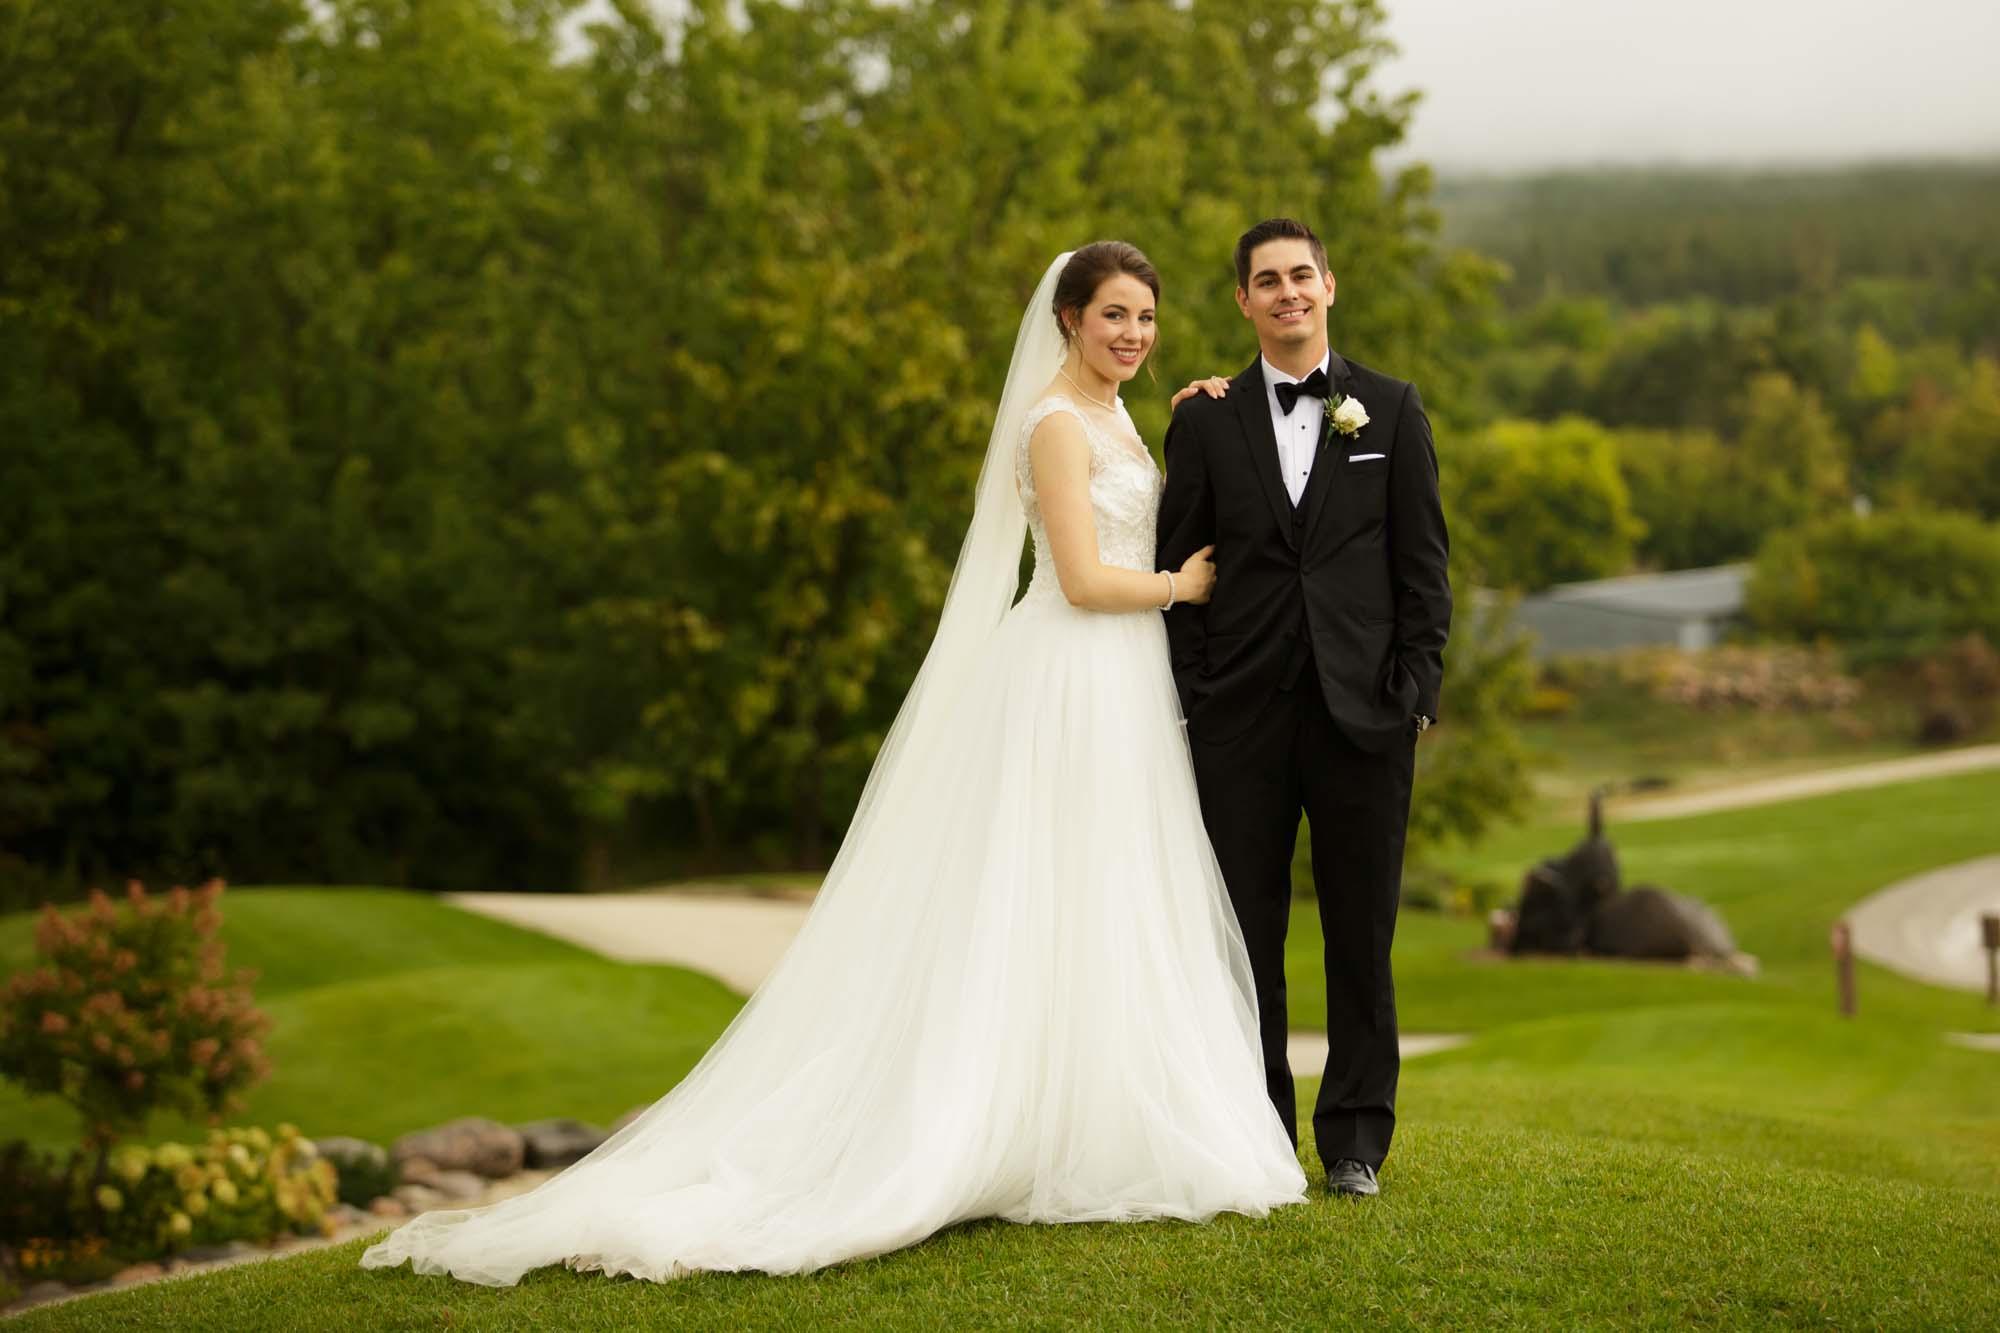 Weddings at Vespra Hills Golf Club